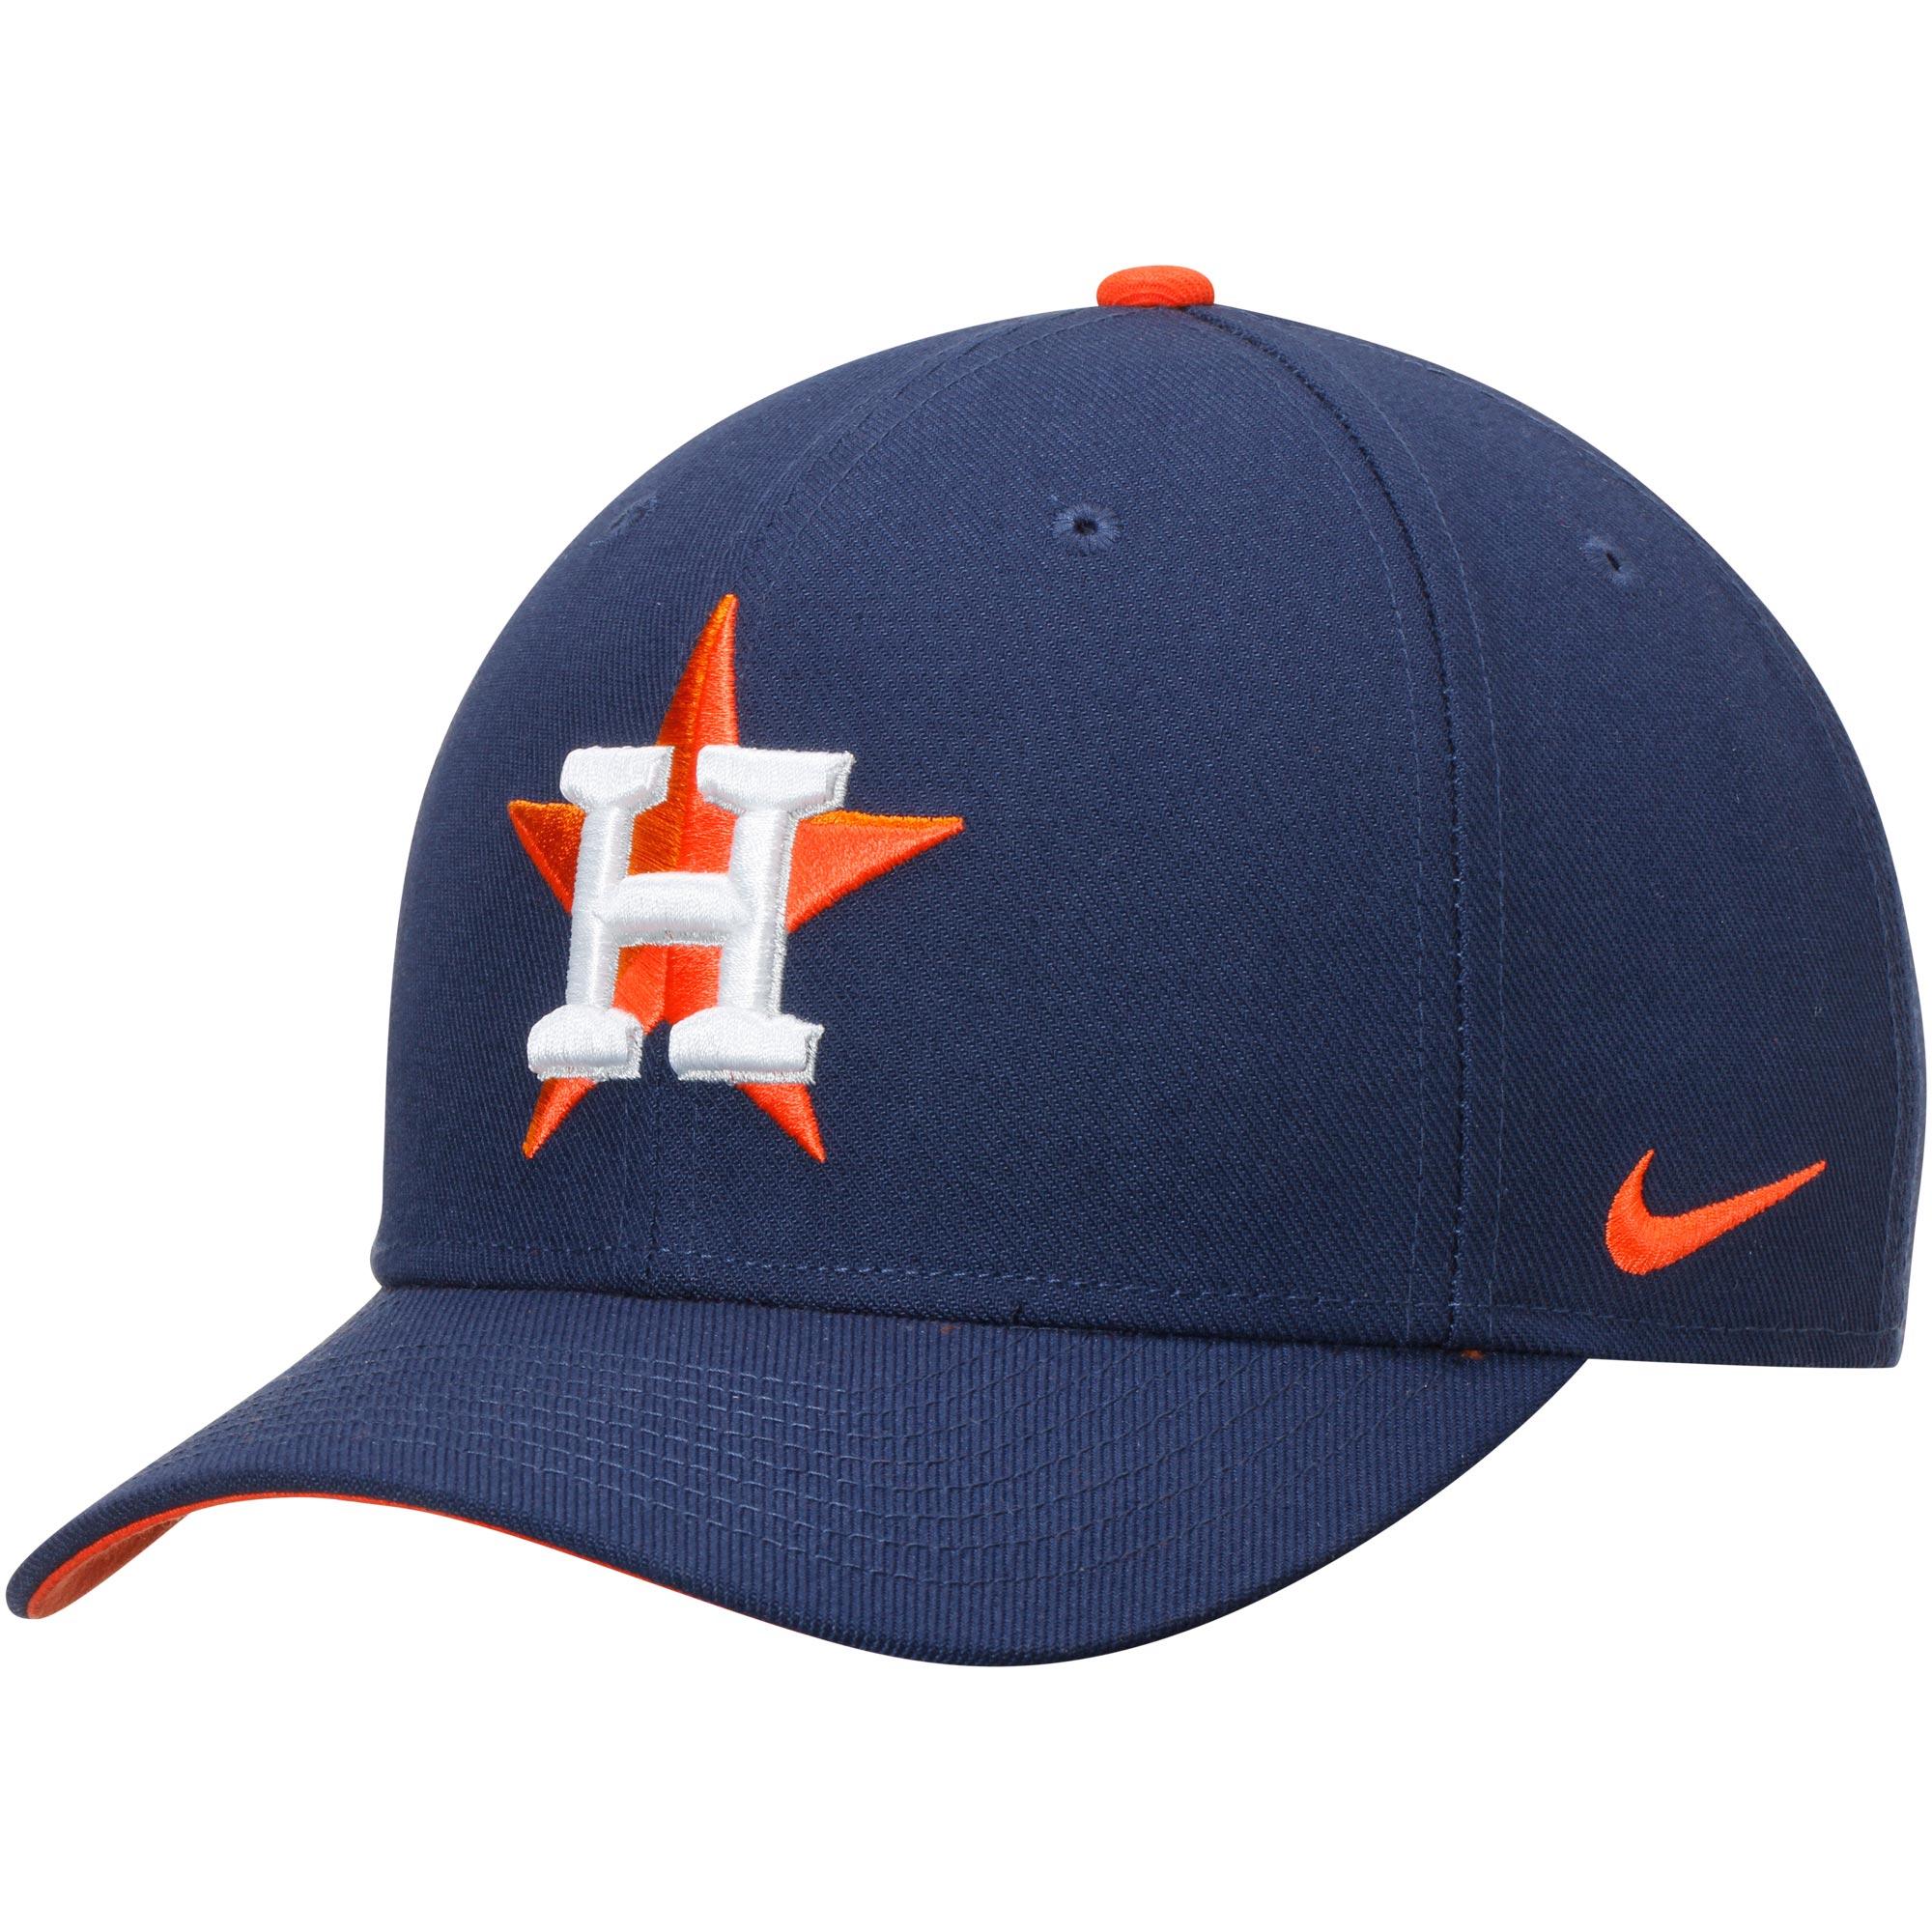 Houston Astros Nike Classic Adjustable Performance Hat - Navy - OSFA